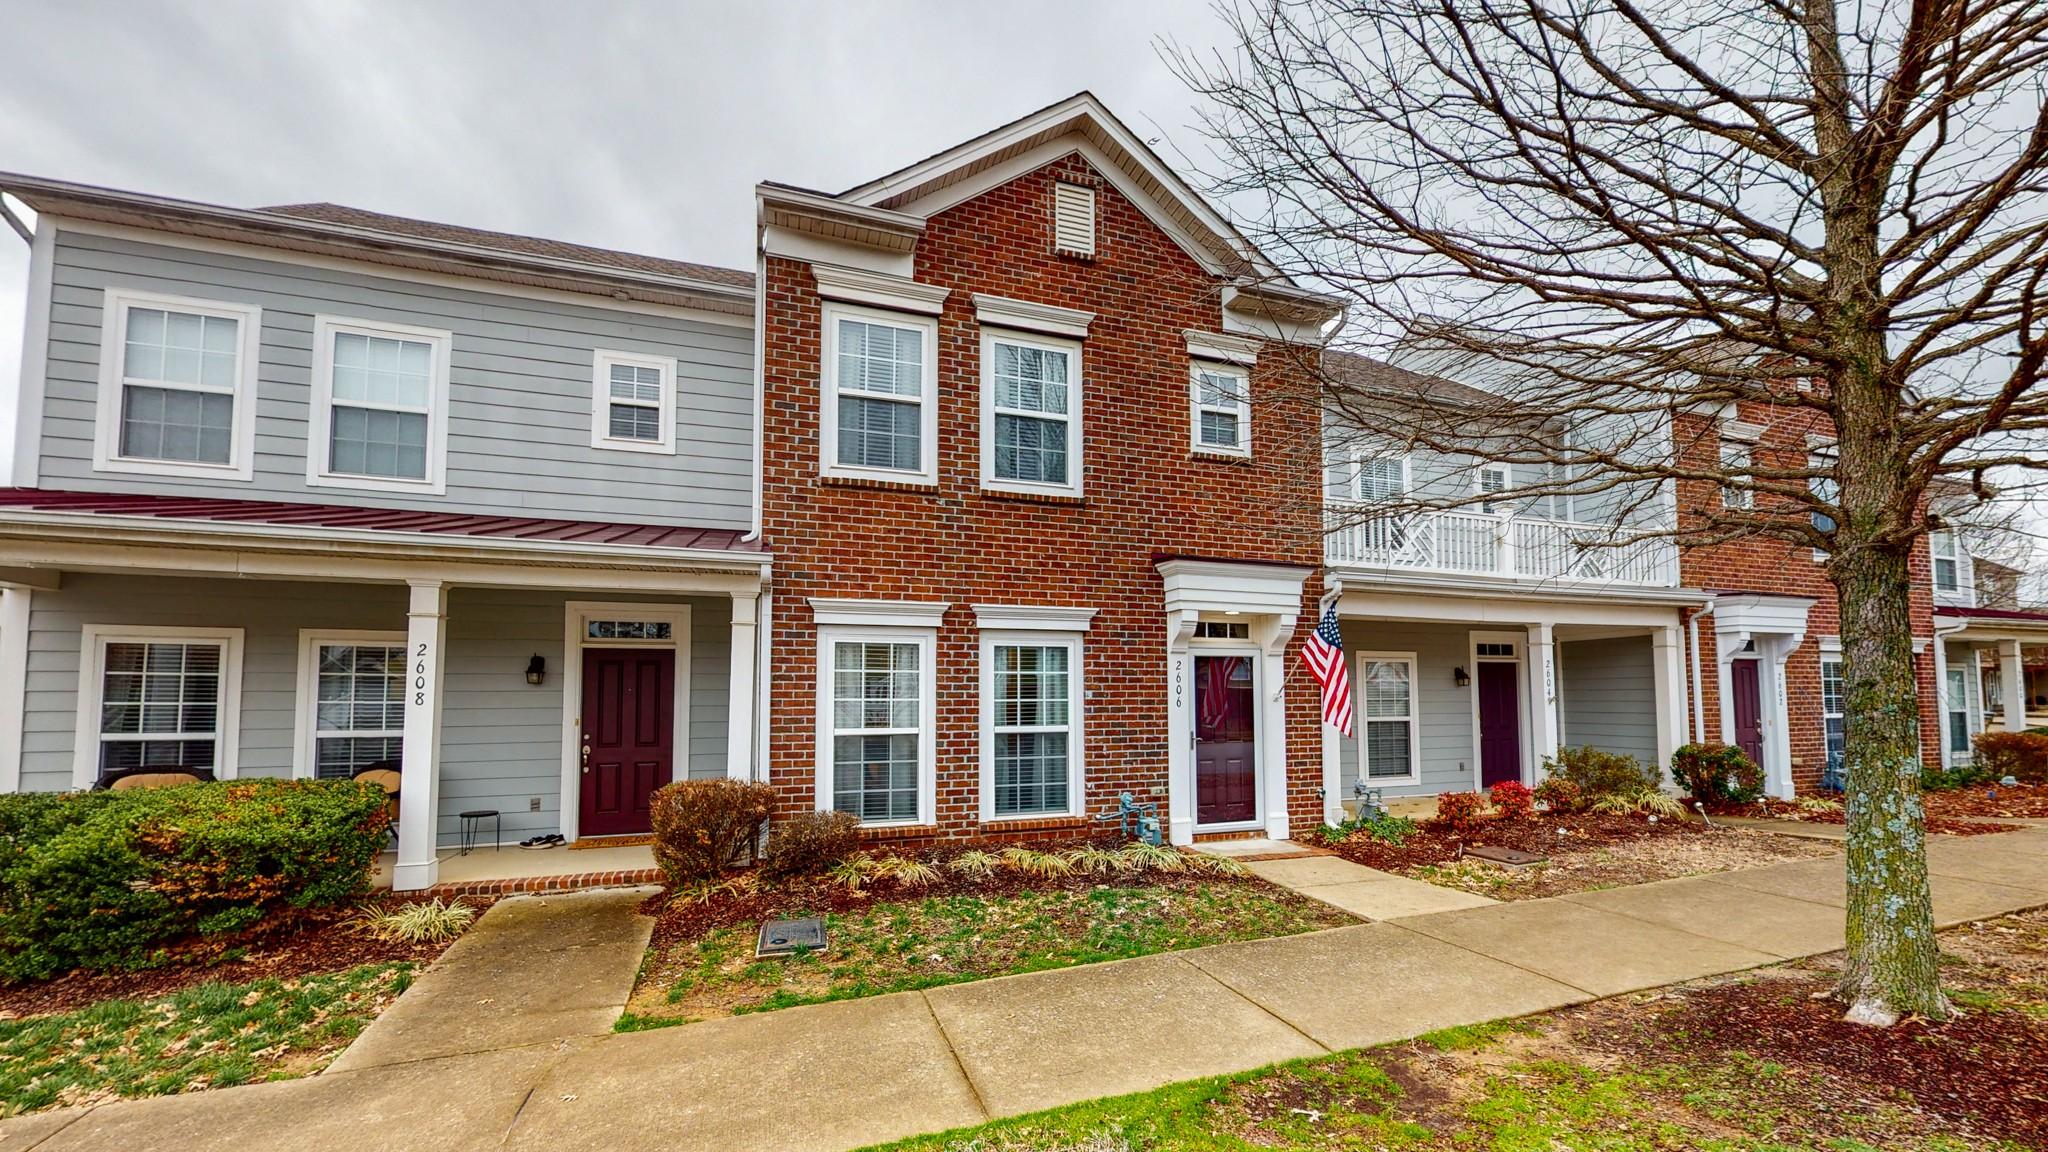 2606 Avery Park Dr, Nashville, TN 37211 - Nashville, TN real estate listing